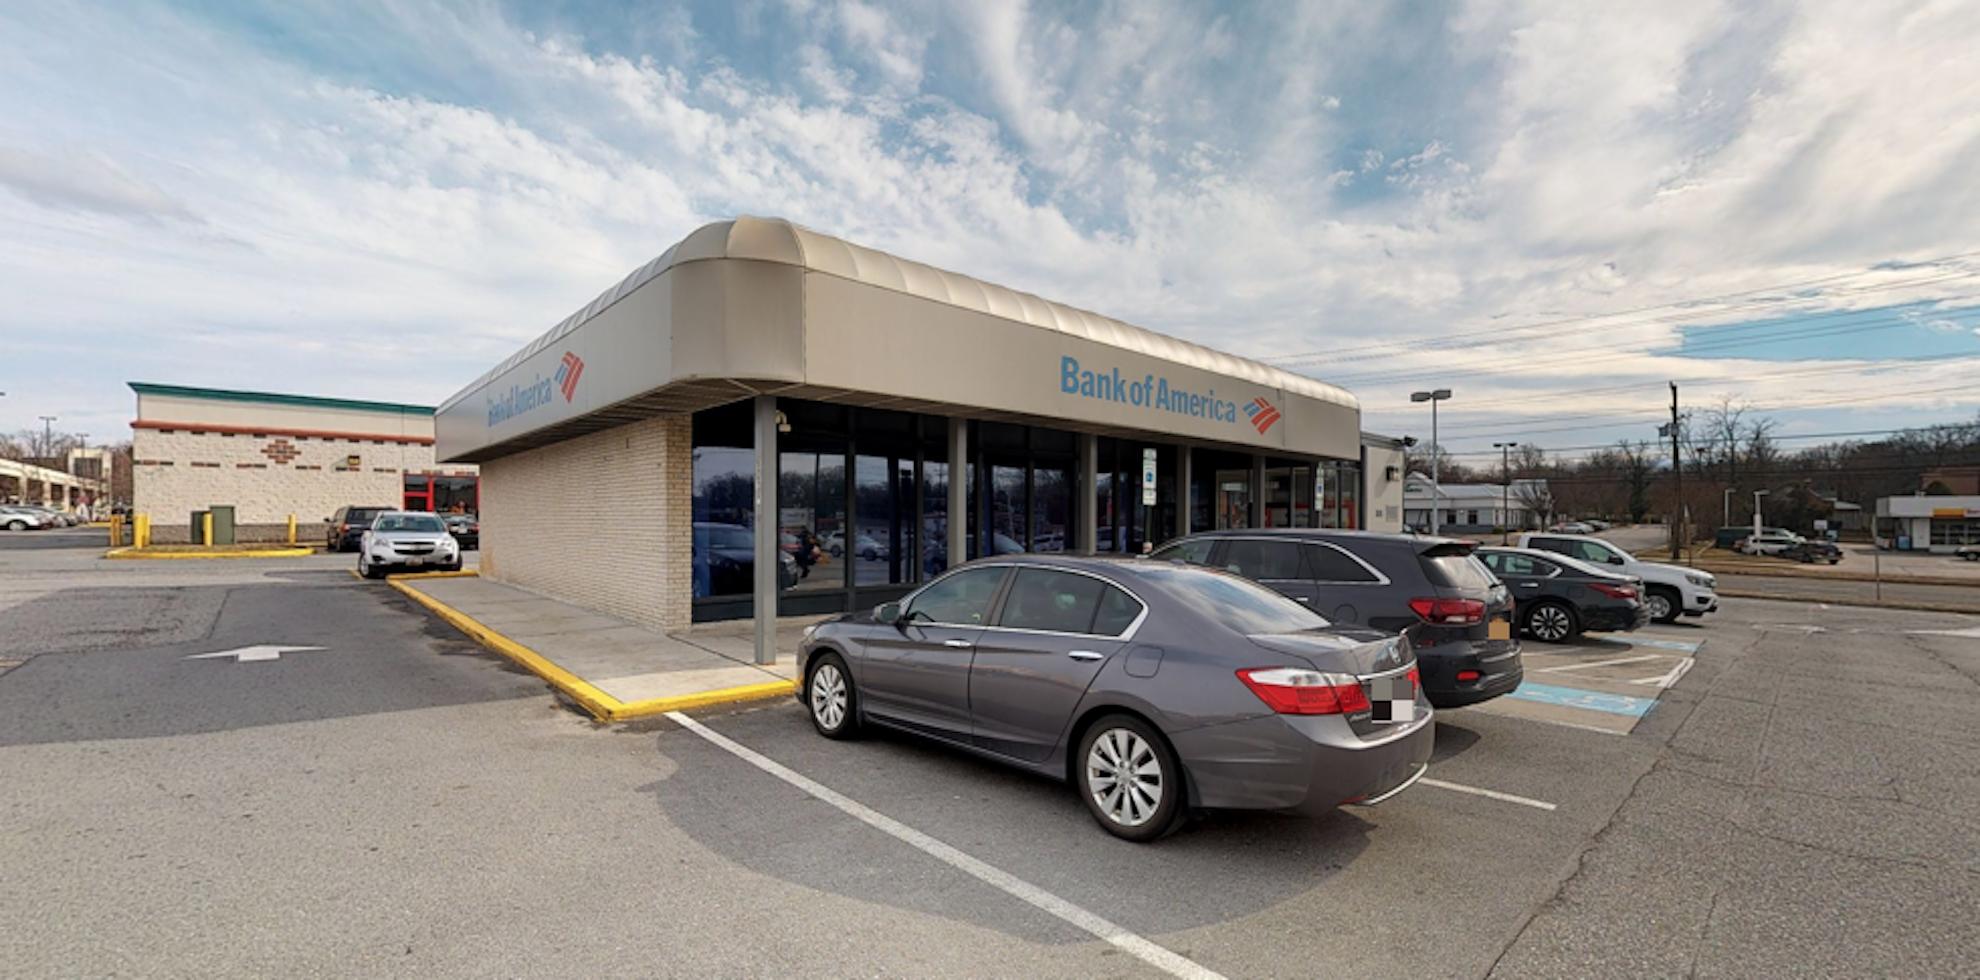 Bank of America financial center with drive-thru ATM   6038 Greenbelt Rd, Greenbelt, MD 20770